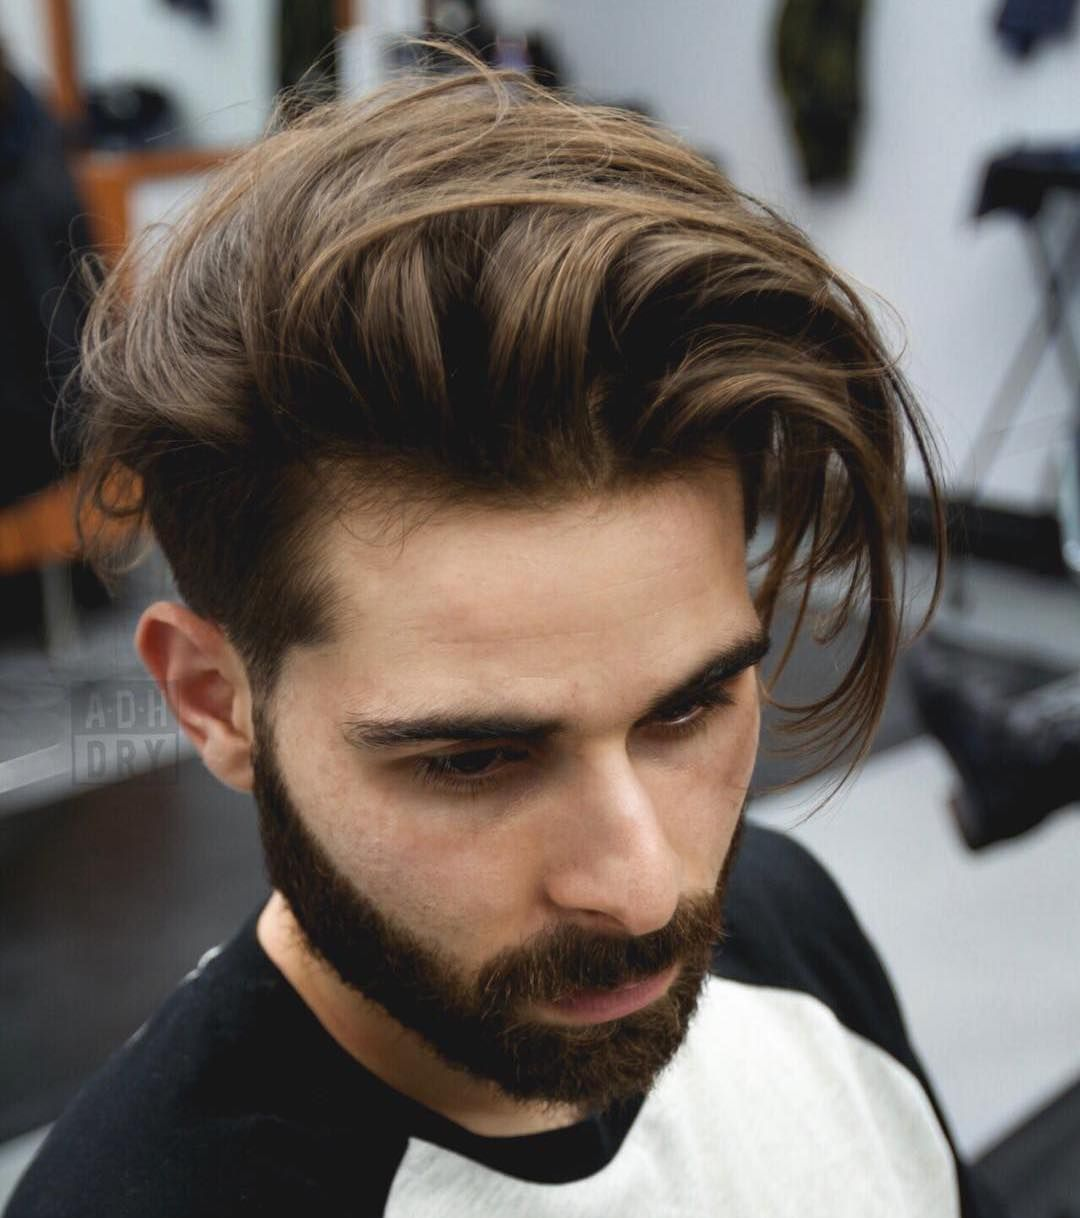 Mens Hairstyles 2017 Long Hairstyle Haircut Styles And Mens Hair